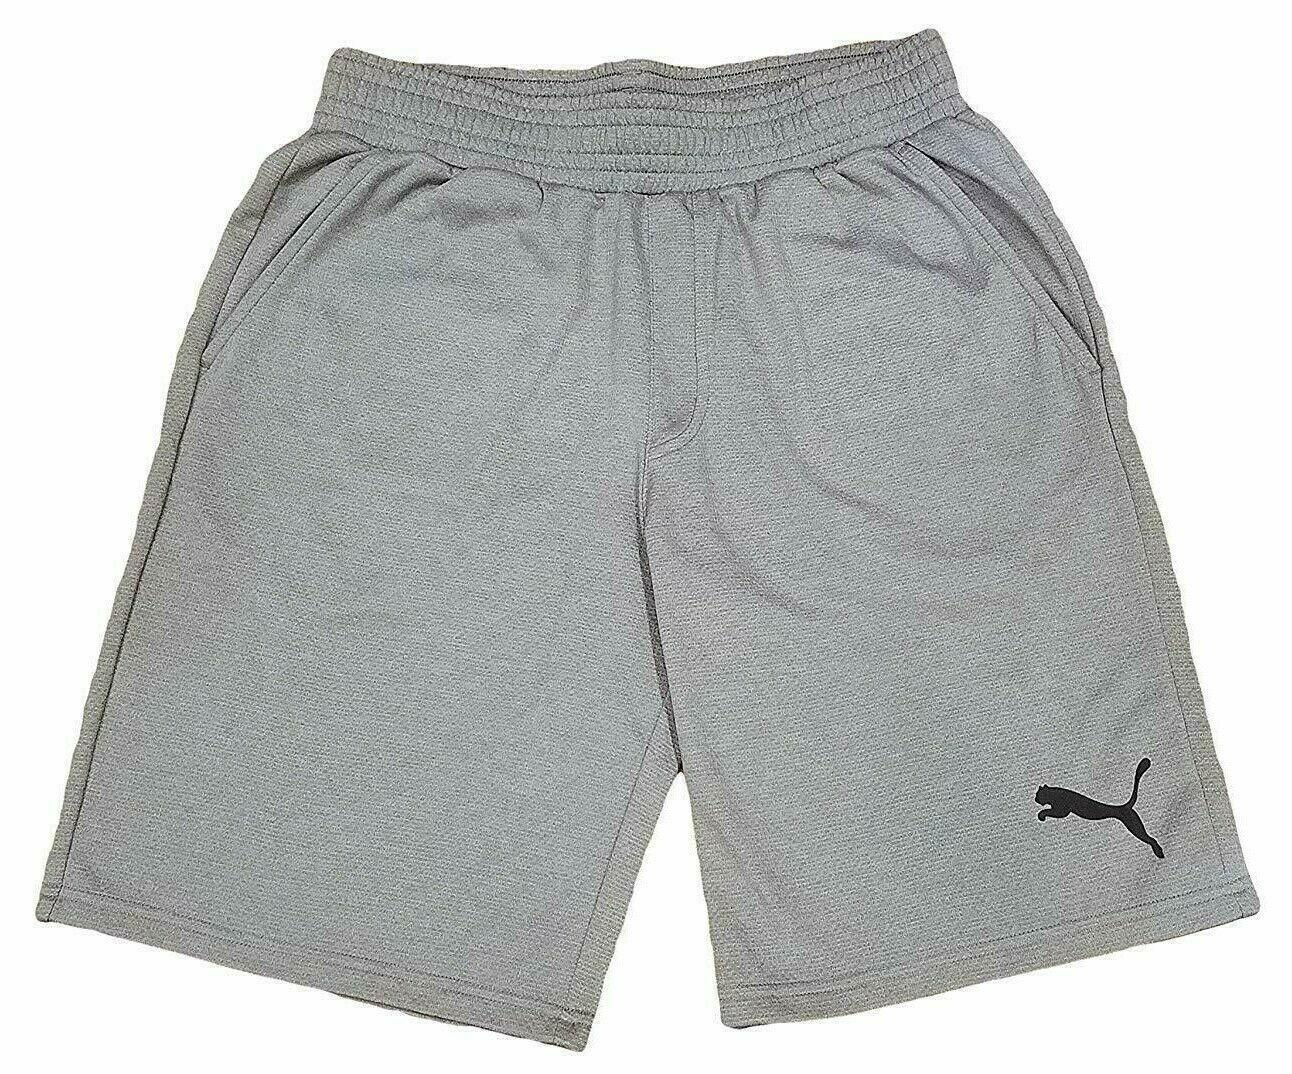 PUMA Energy Men's Shorts 10 inch Medium, Dark Grey or Peacoat Heather TD19342-51